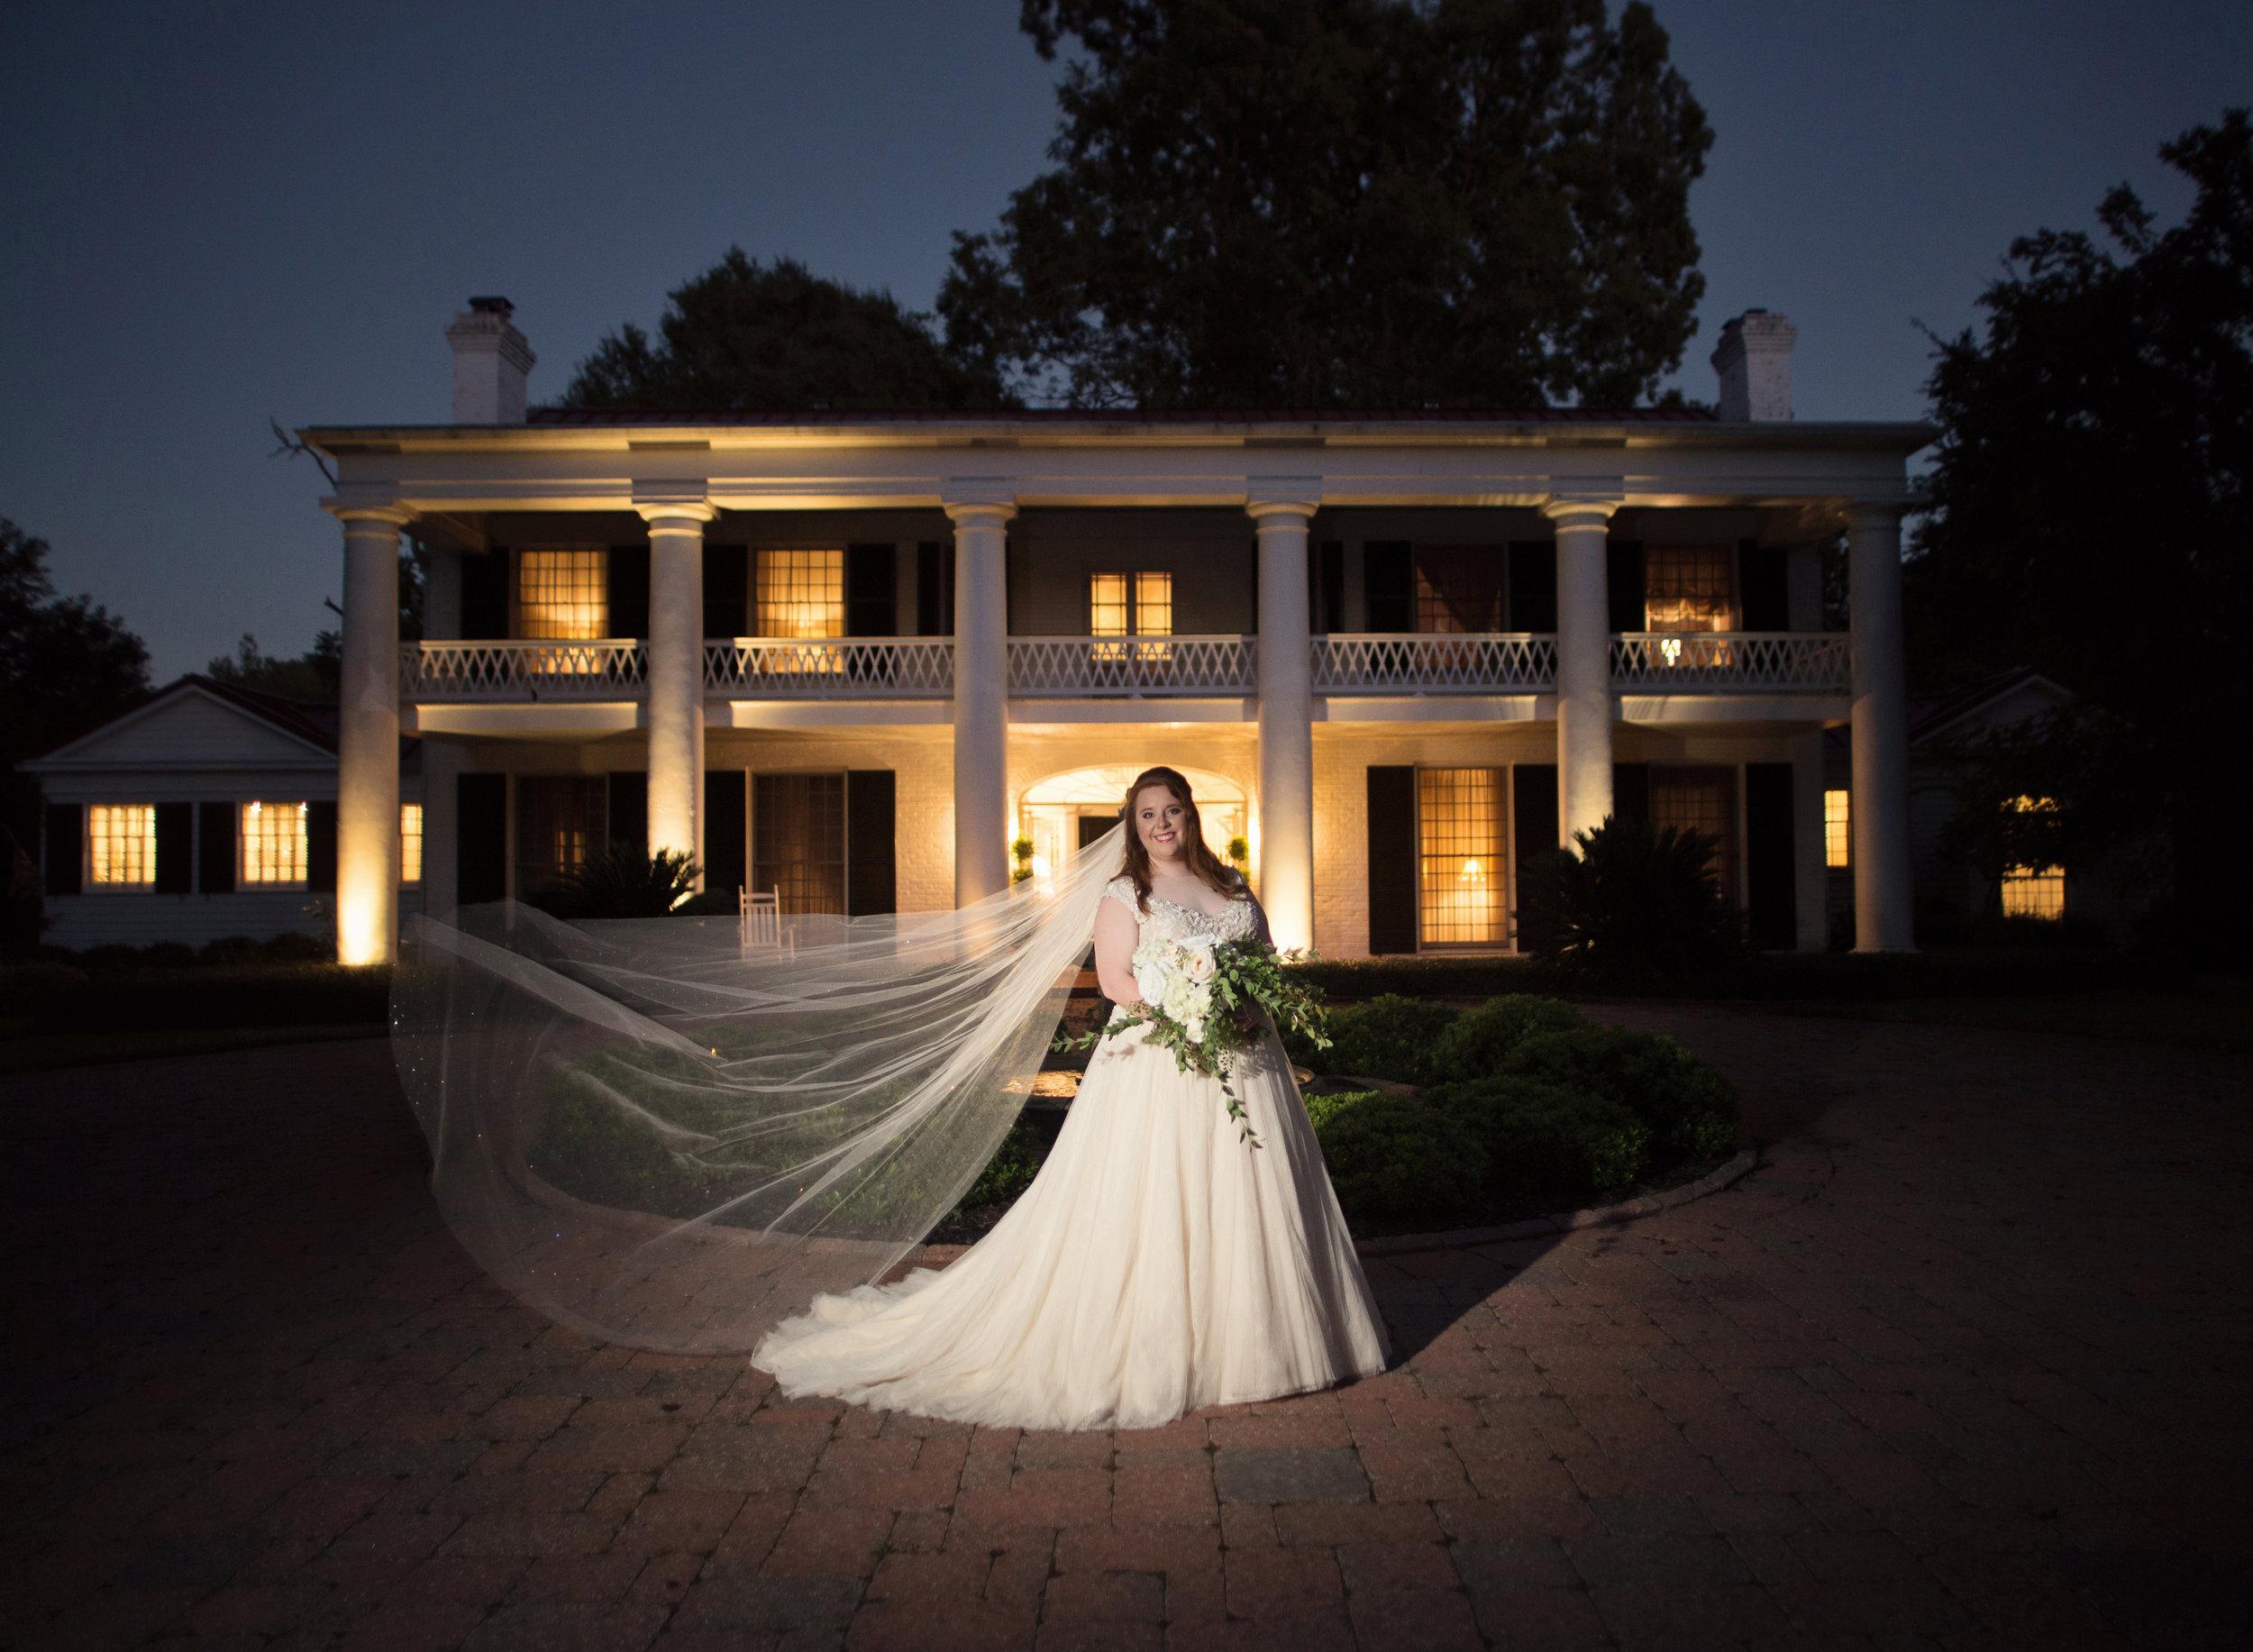 Shreveport / Bossier City Wedding Photographer - daylightfadingphotography.com